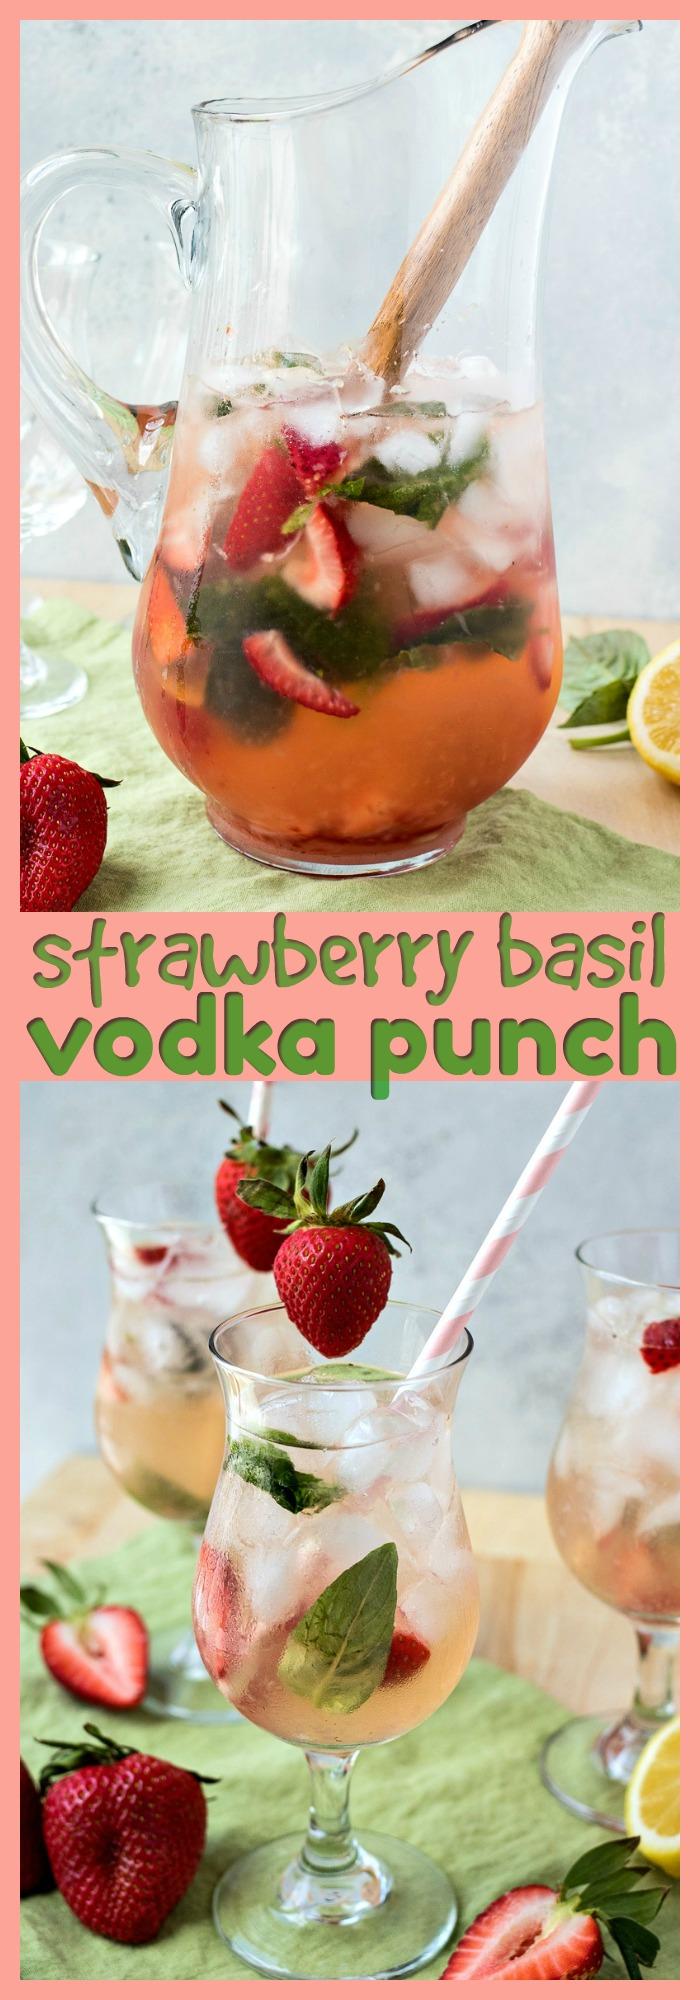 Strawberry Basil Vodka Punch photo collage